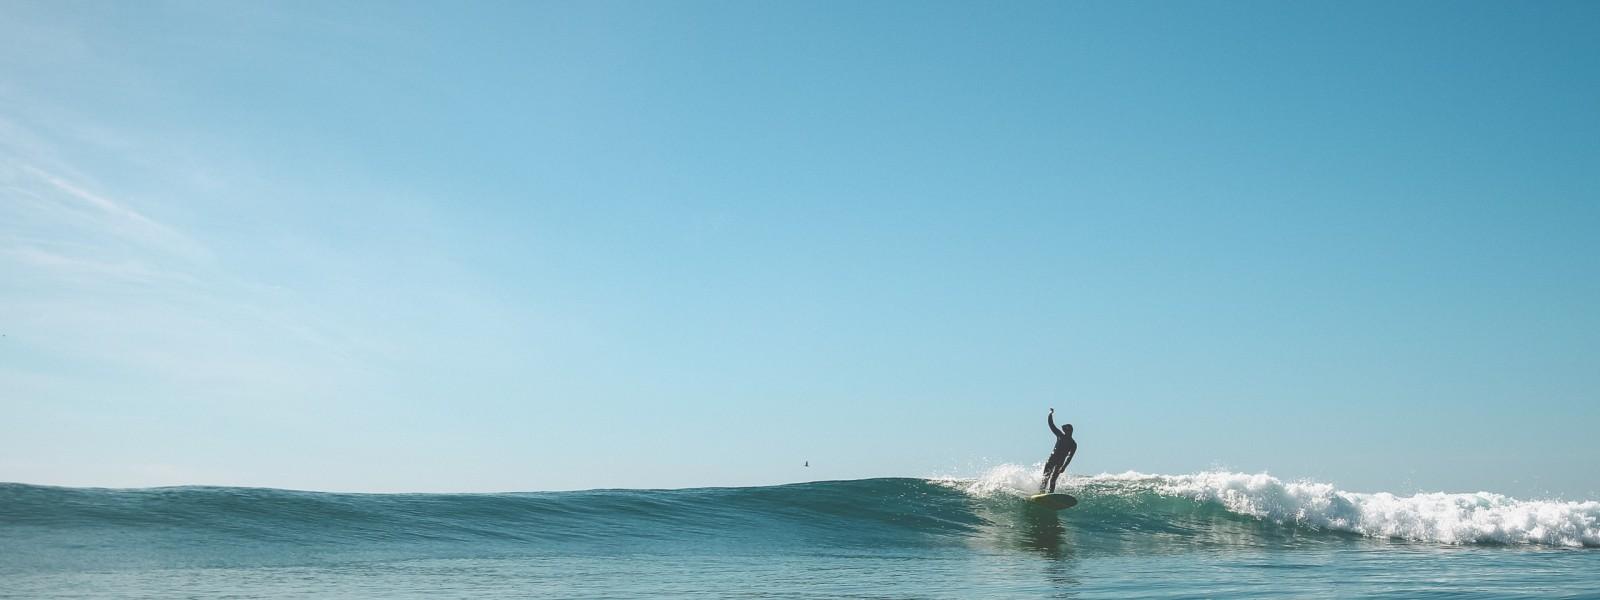 Imsouane - surf maroc - the bay